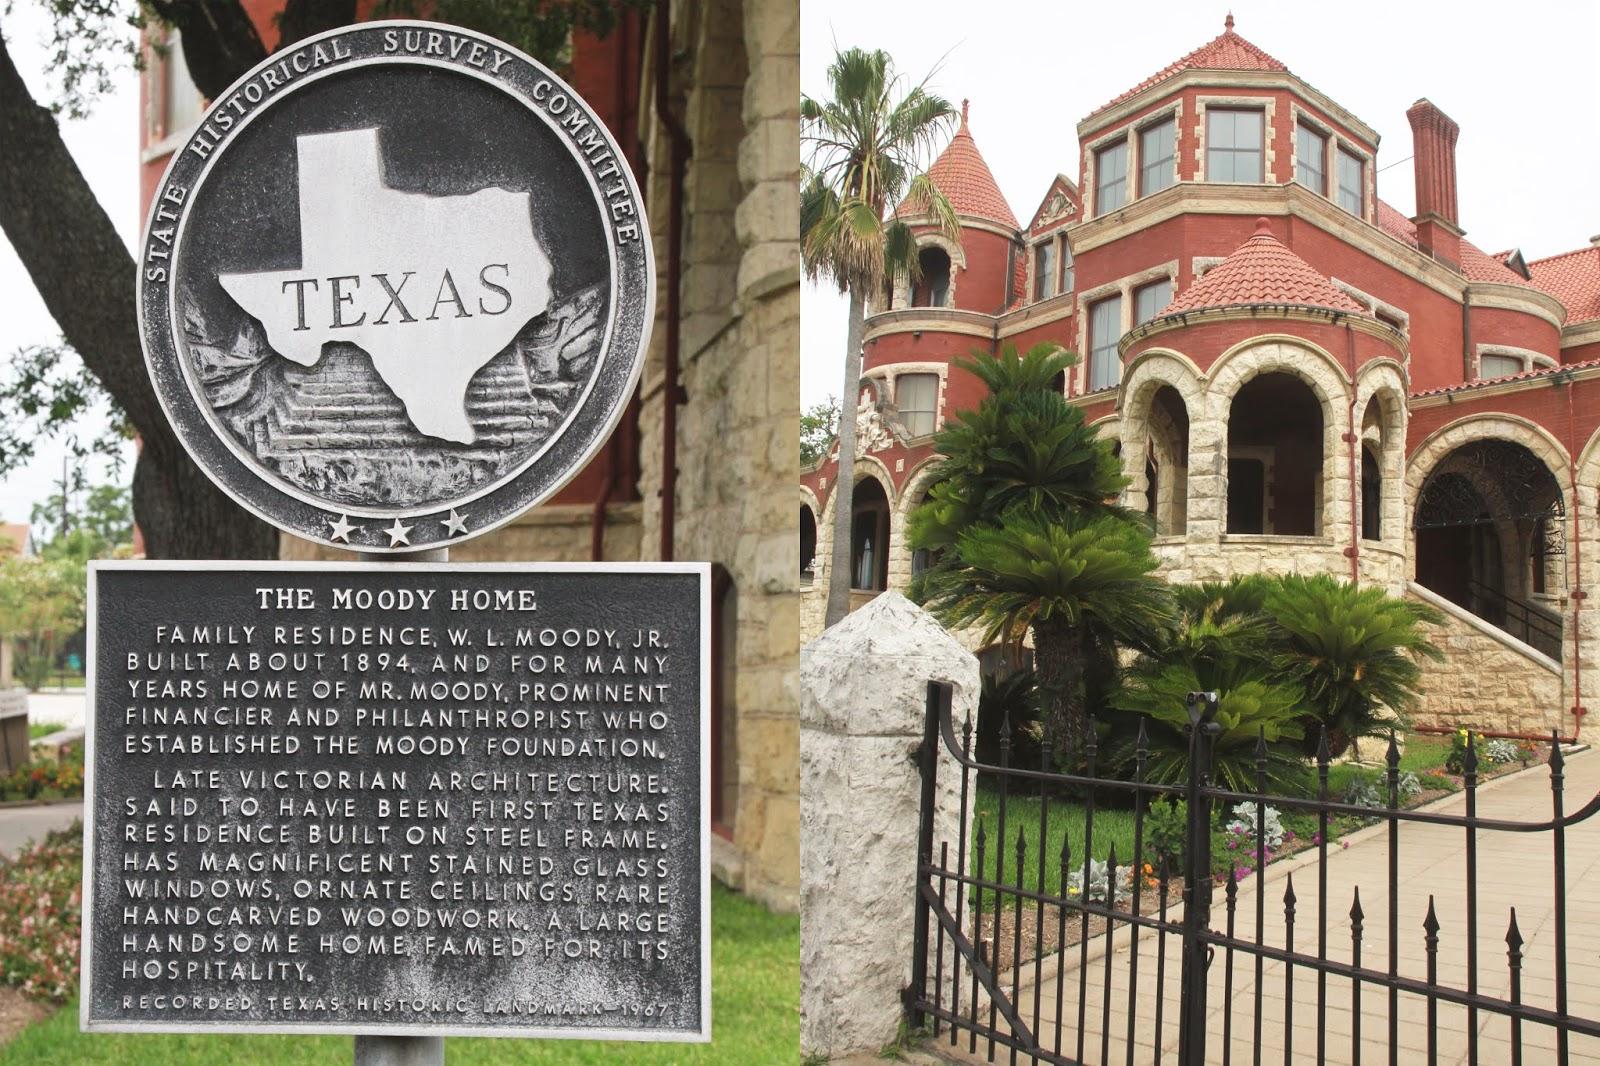 Moody Mansion Galveston, historic Galveston tours, historic Galveston homes, mansions in Galveston, mansion tours Galveston Texas